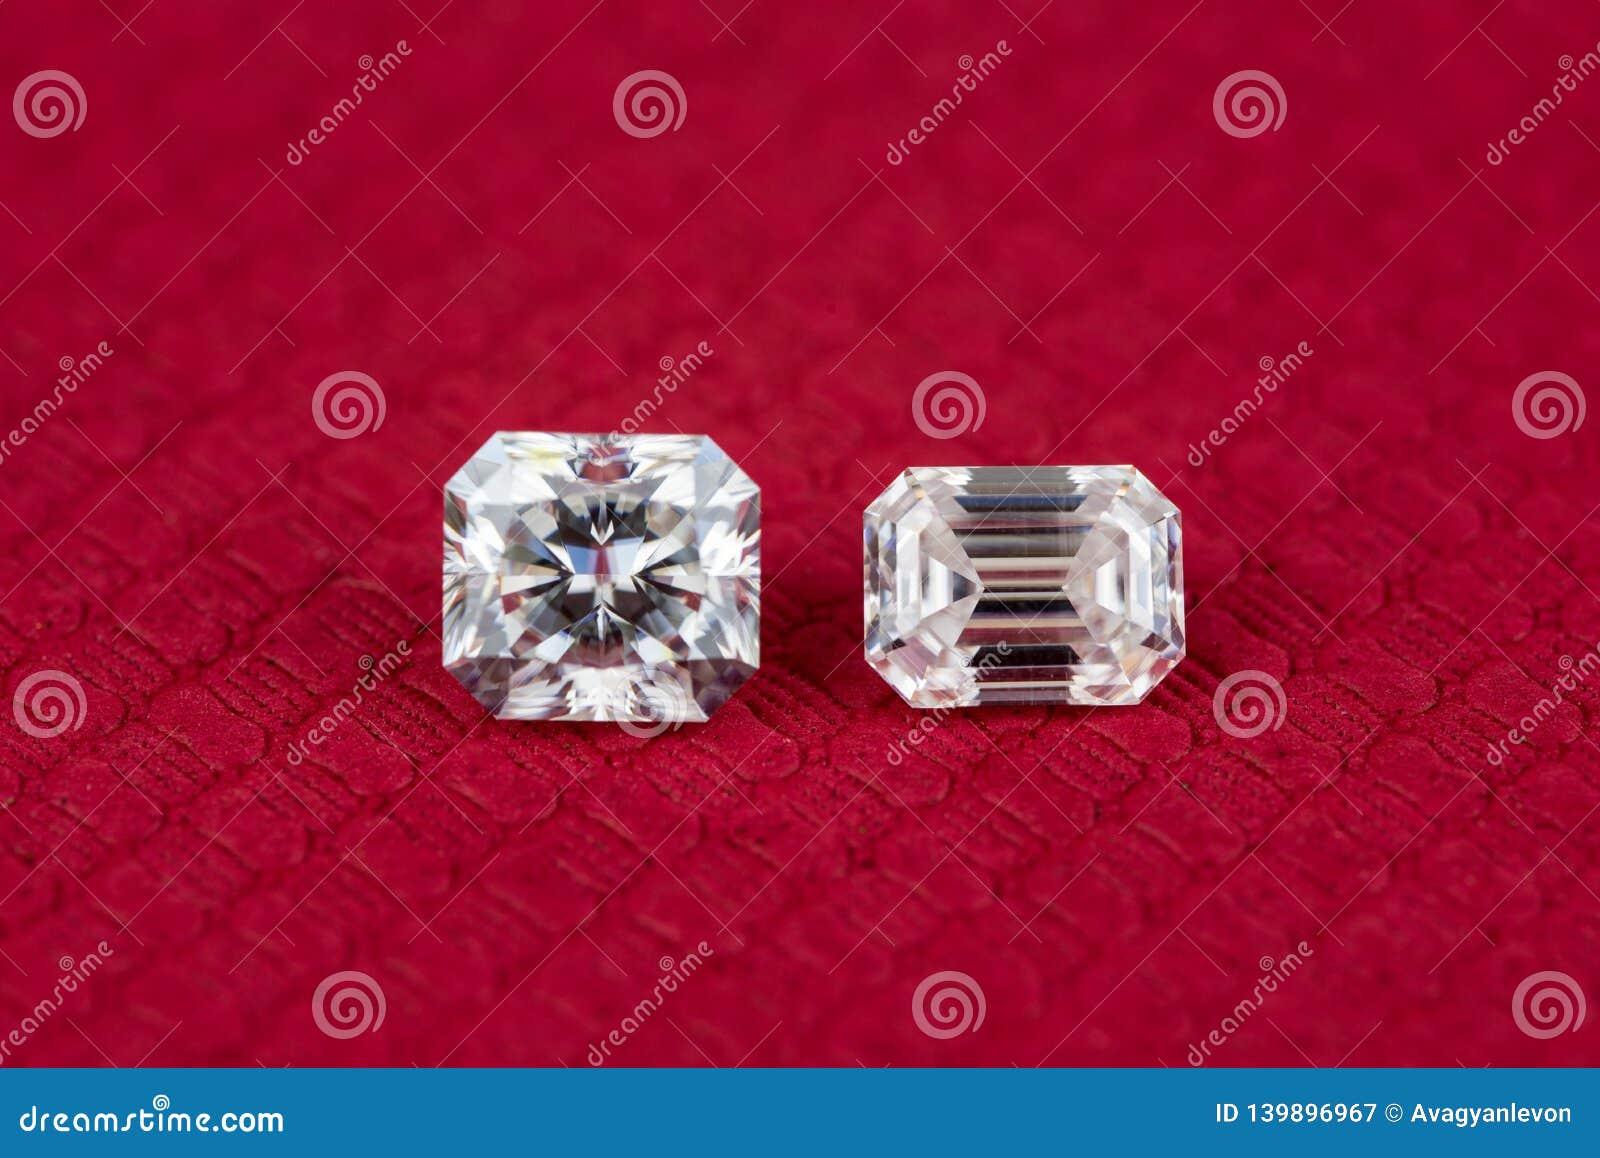 4b535694750c7 Diamond Radiant And Emerald Cut Stock Image - Image of stone ...